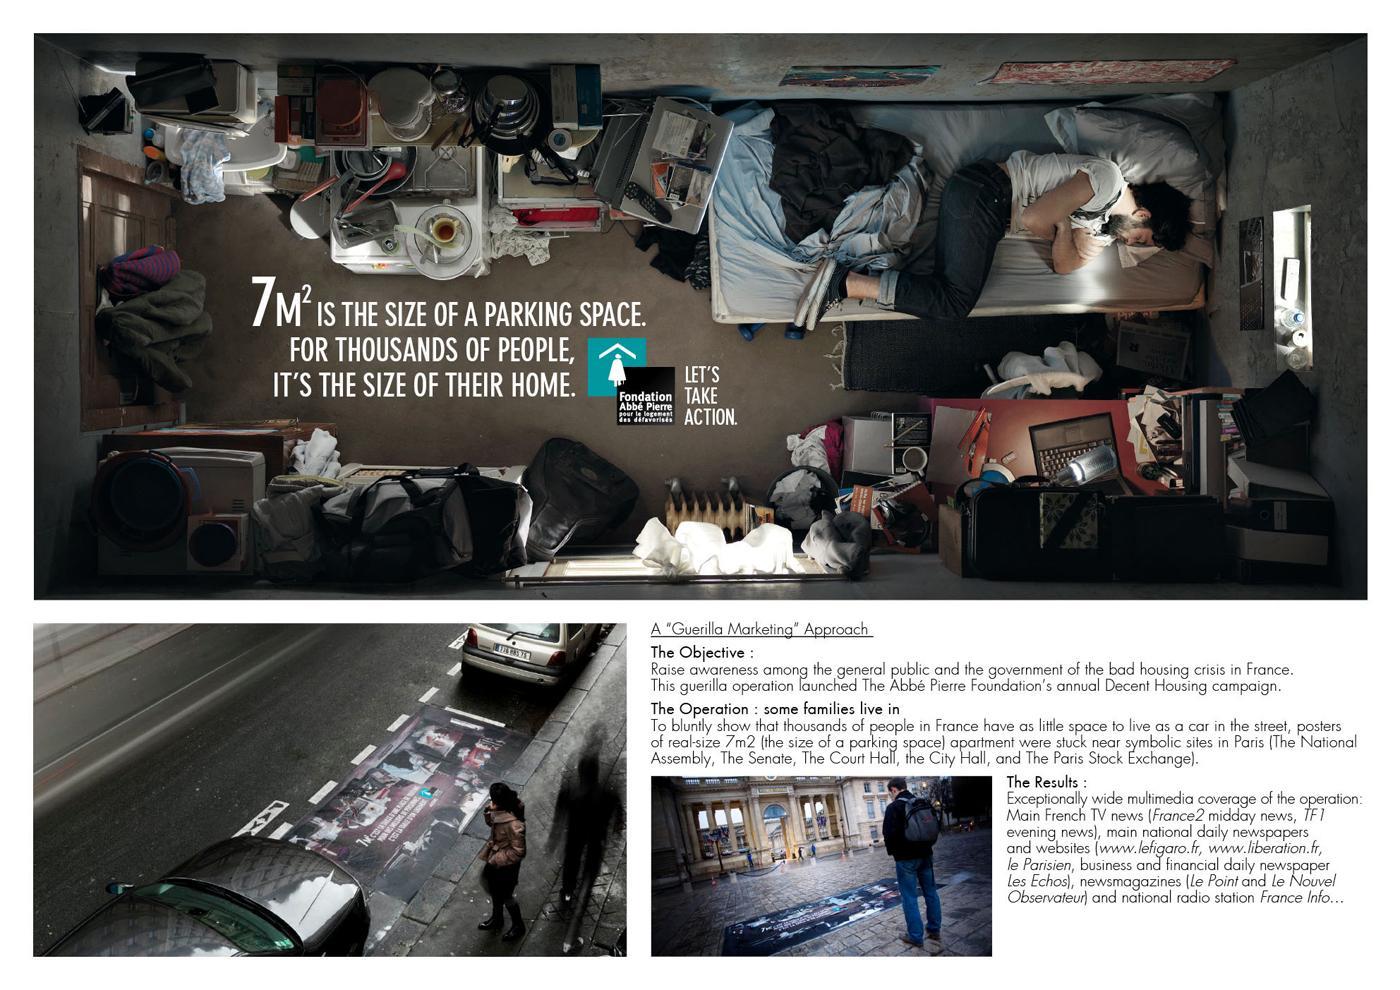 Fondation Abbé Pierre Outdoor Ad -  7